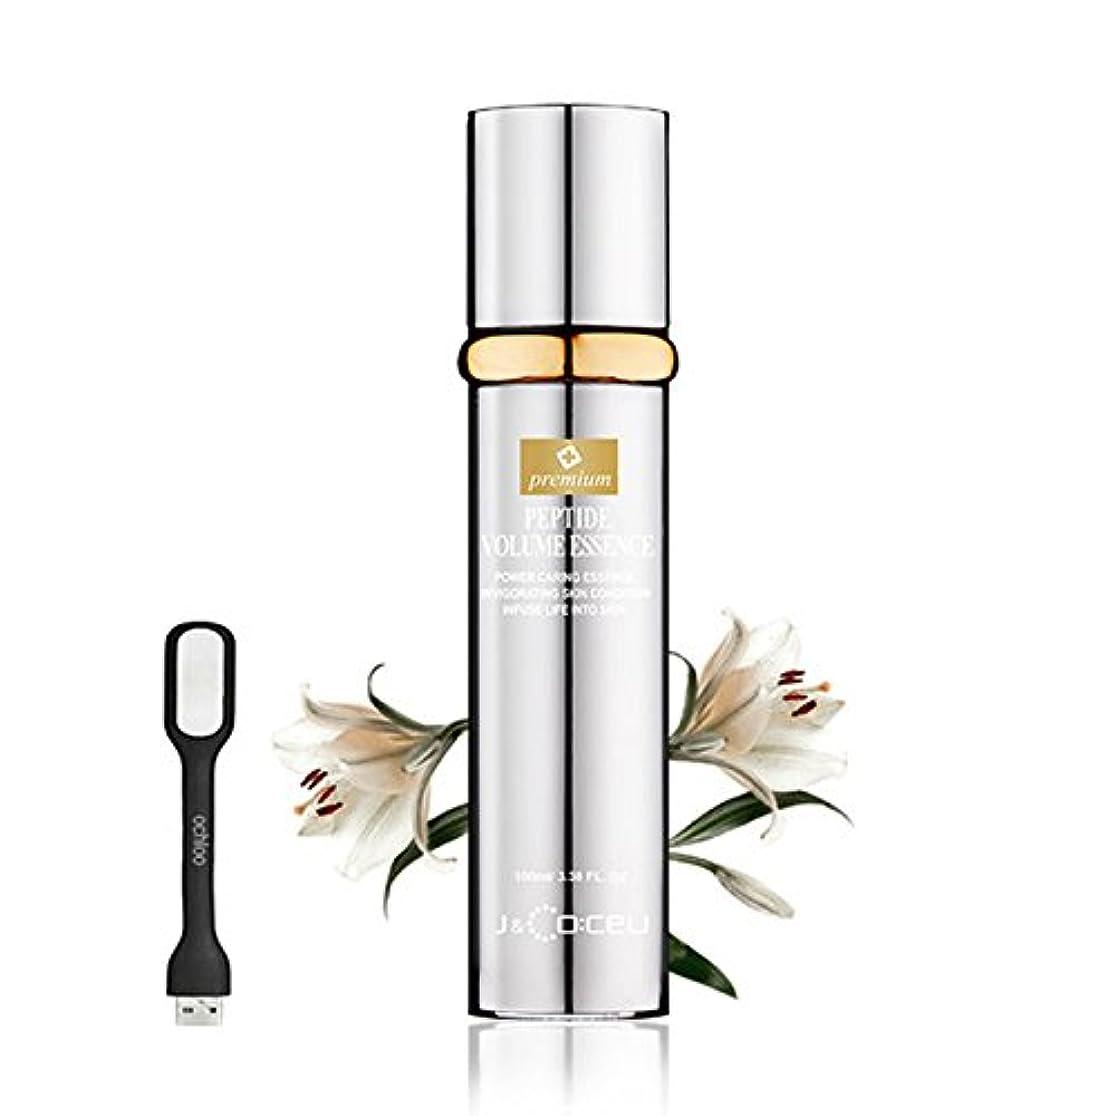 一時停止爆発物小説家Premium Peptide Volume Essence 100ml: Upgraded Cosmetic Botox Anti-Wrinkle Essence All in One Wrinkle-care Firming...